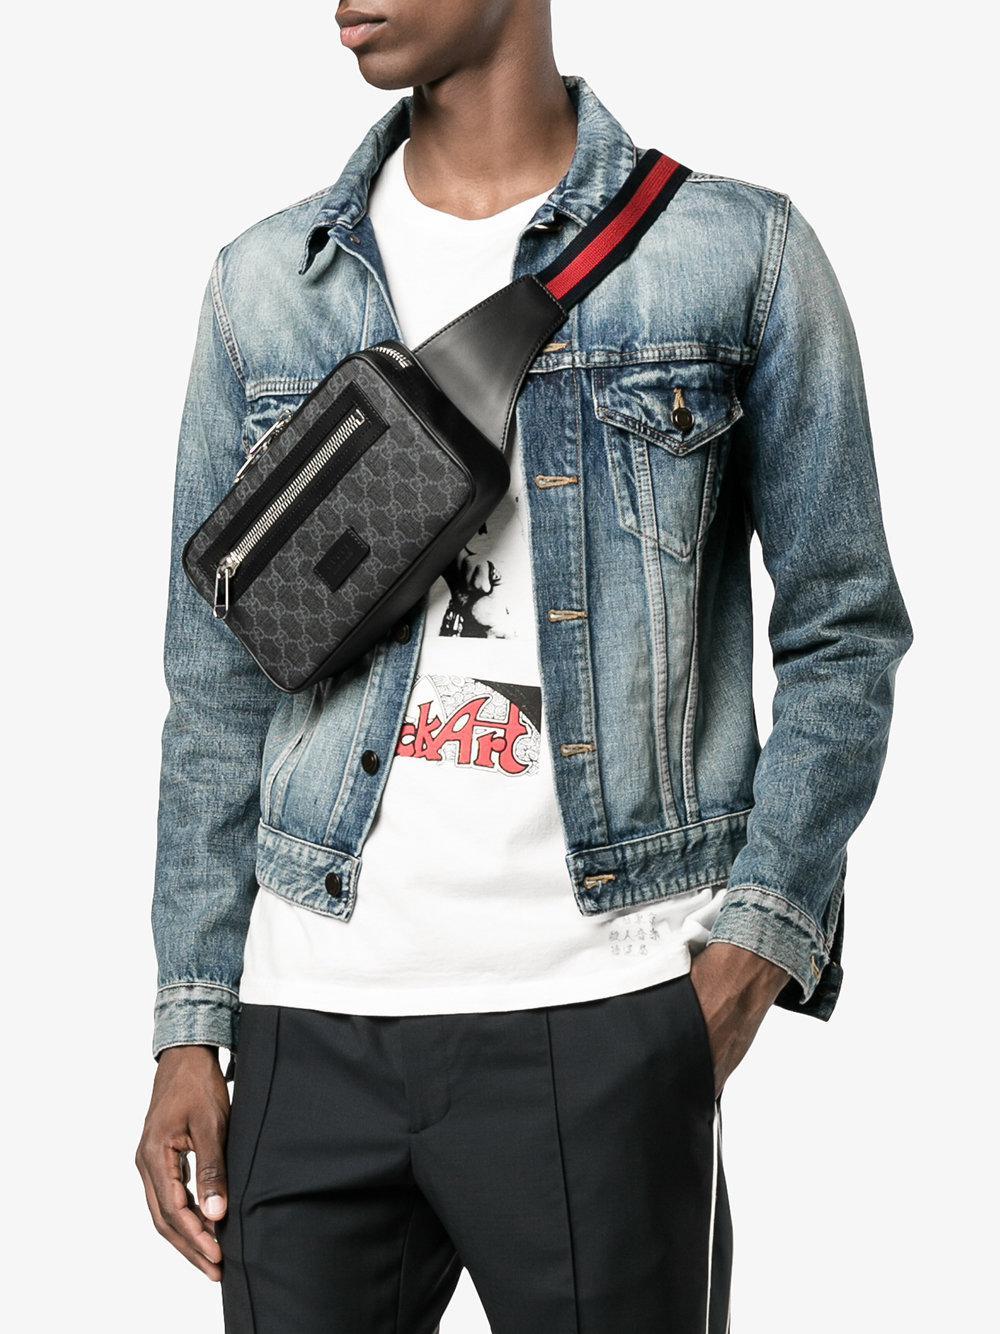 62a08f0df20 Gucci Gg Supreme Belt Bag in Black for Men - Lyst